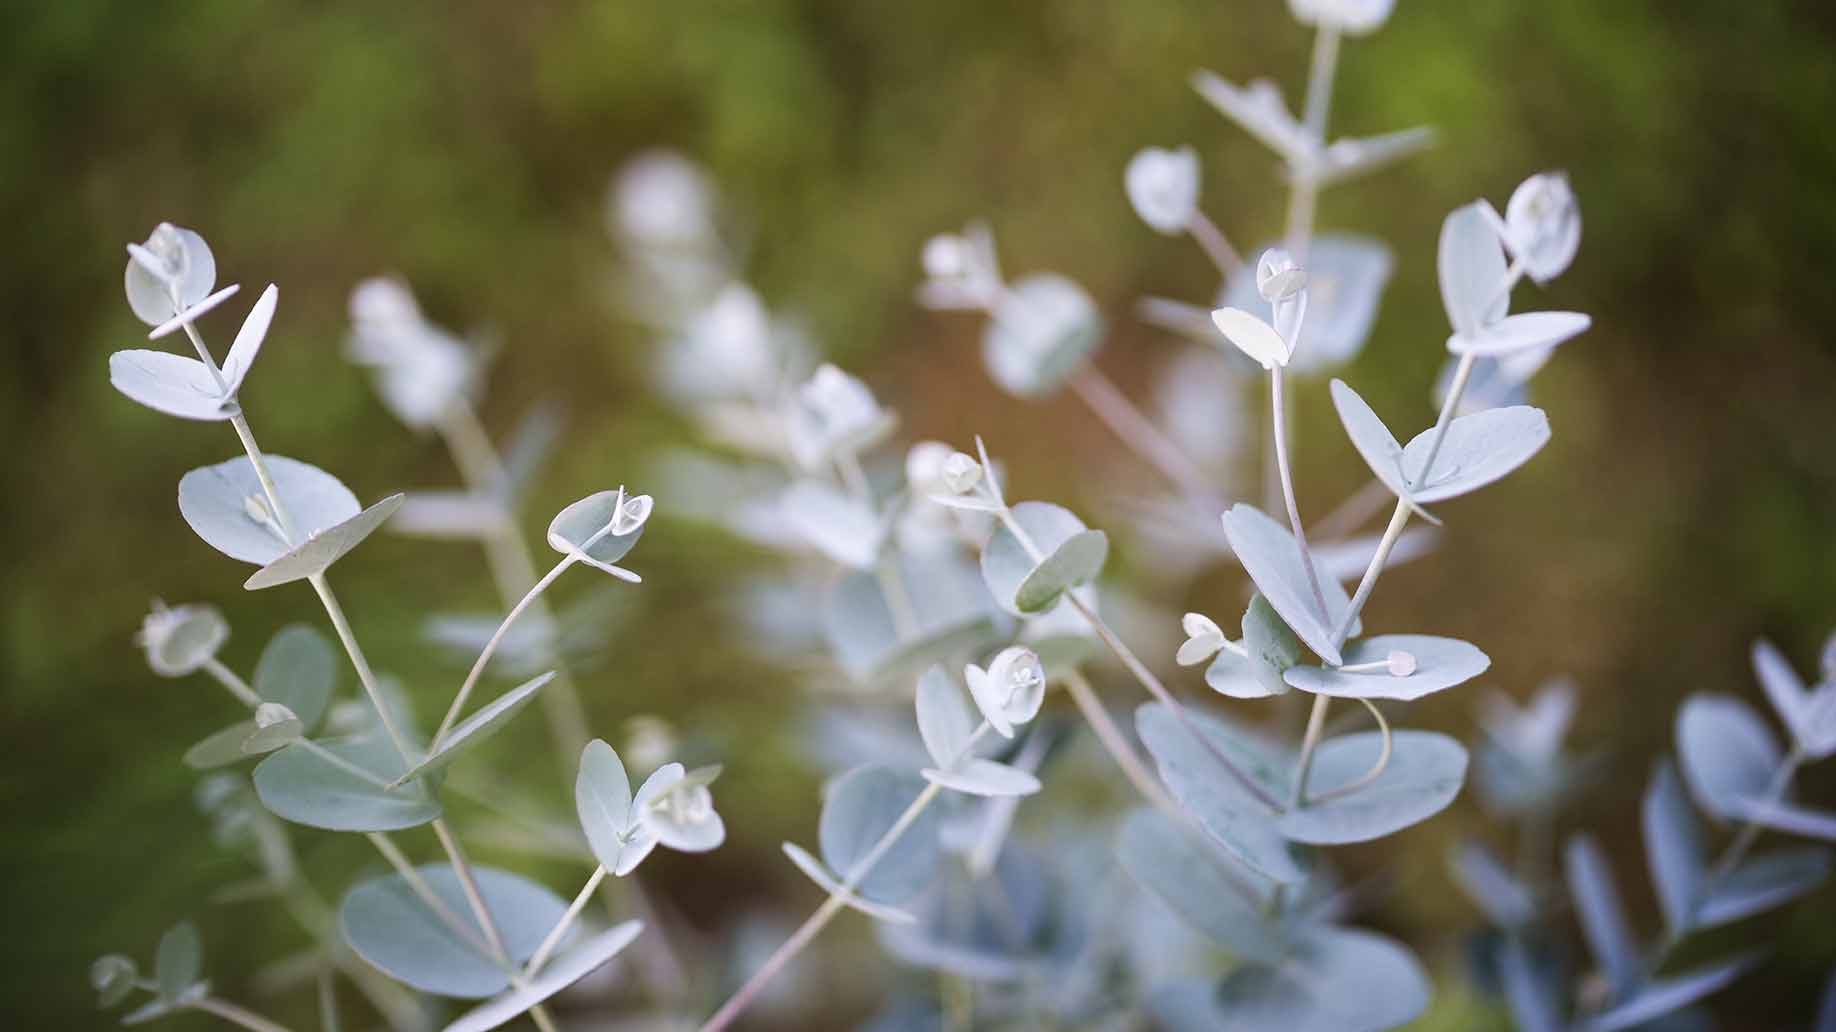 How To Make Your Own Natural Homemade Shampoo 10 Best Recipes Gieve Eucalyptus Hair Conditioner Mint Invigorating